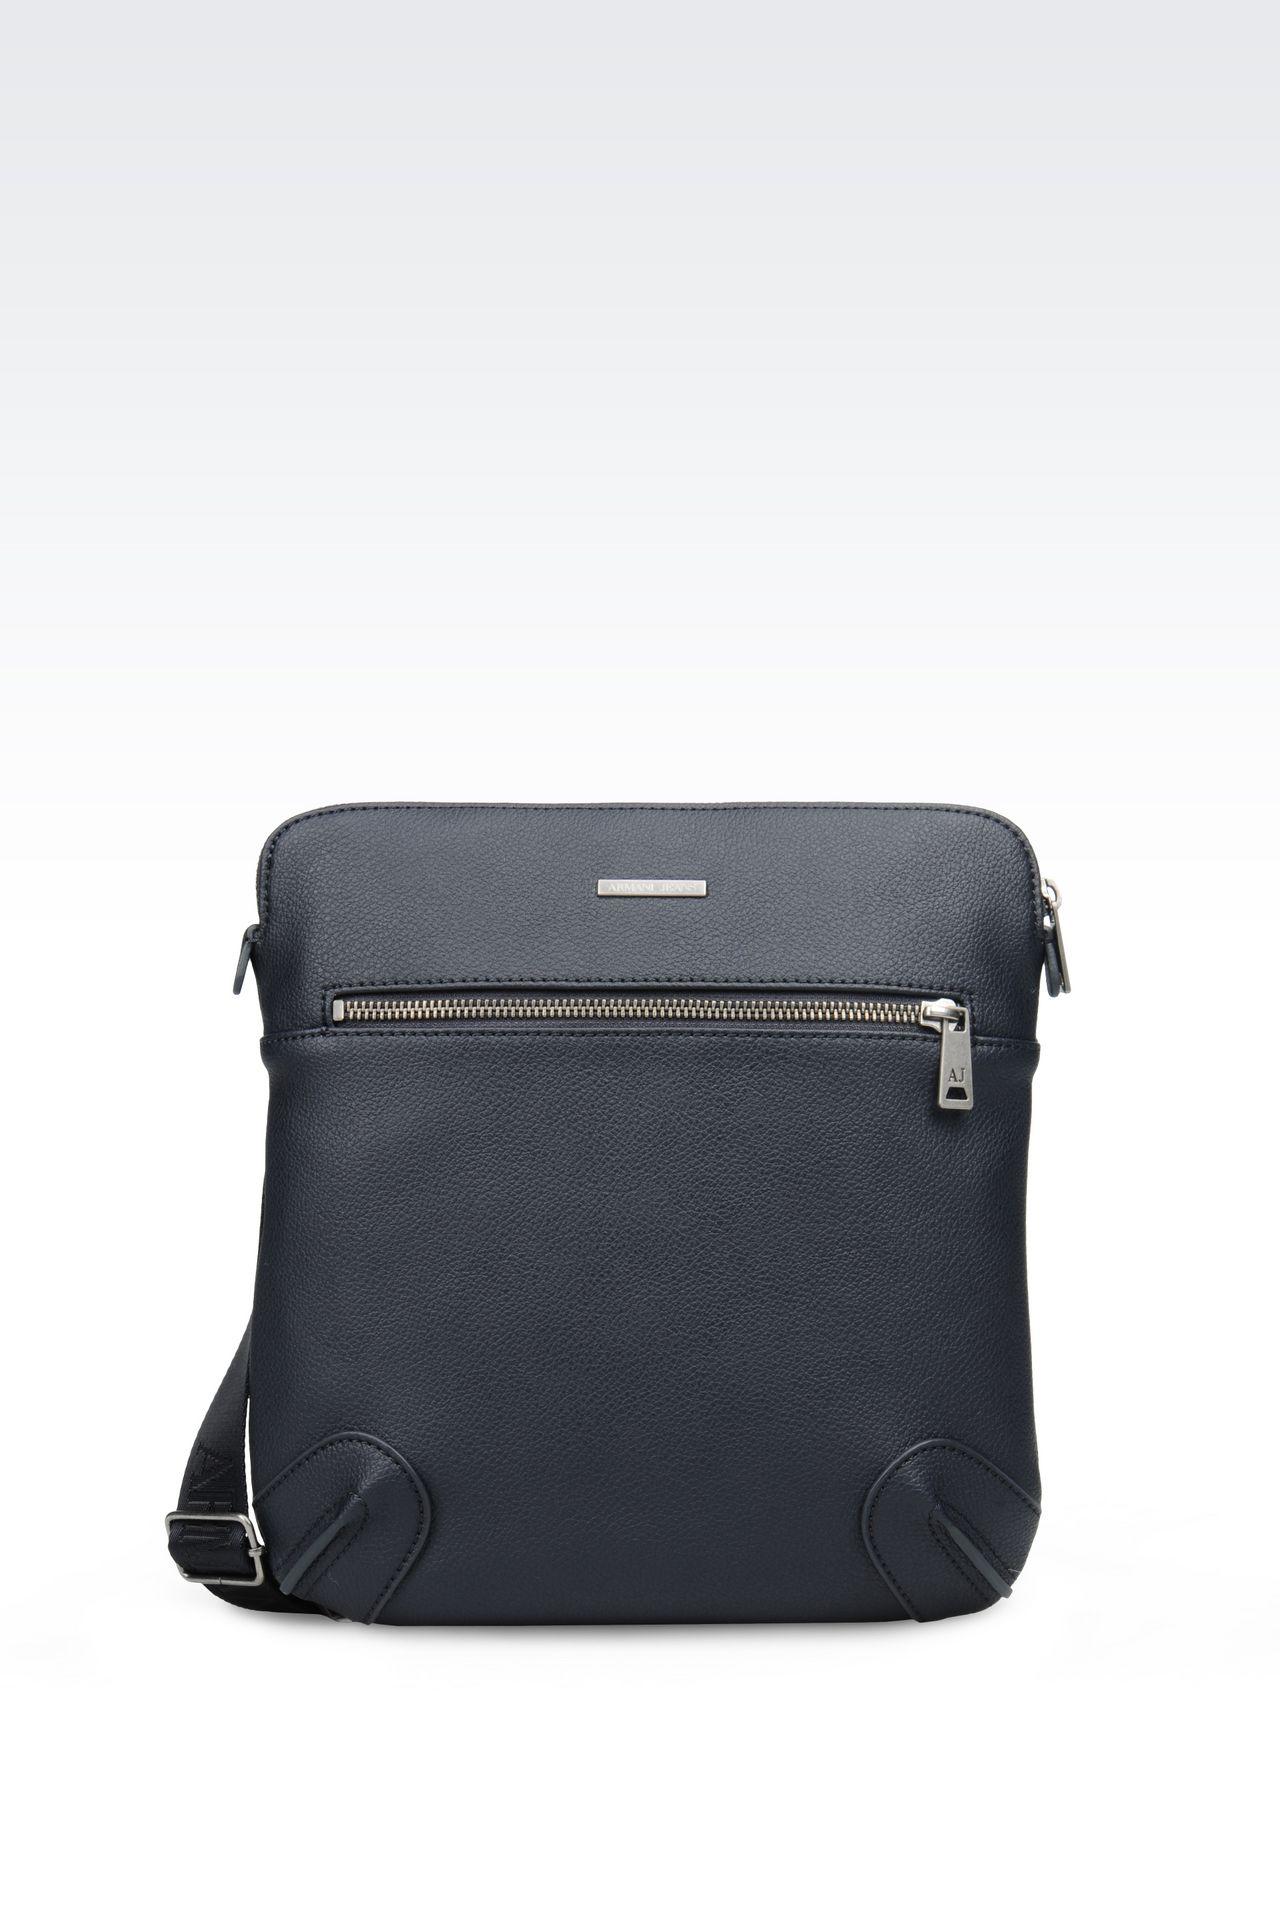 Armani Jeans Men FLAT MESSENGER BAG IN FAUX LEATHER, Polyurethane ...